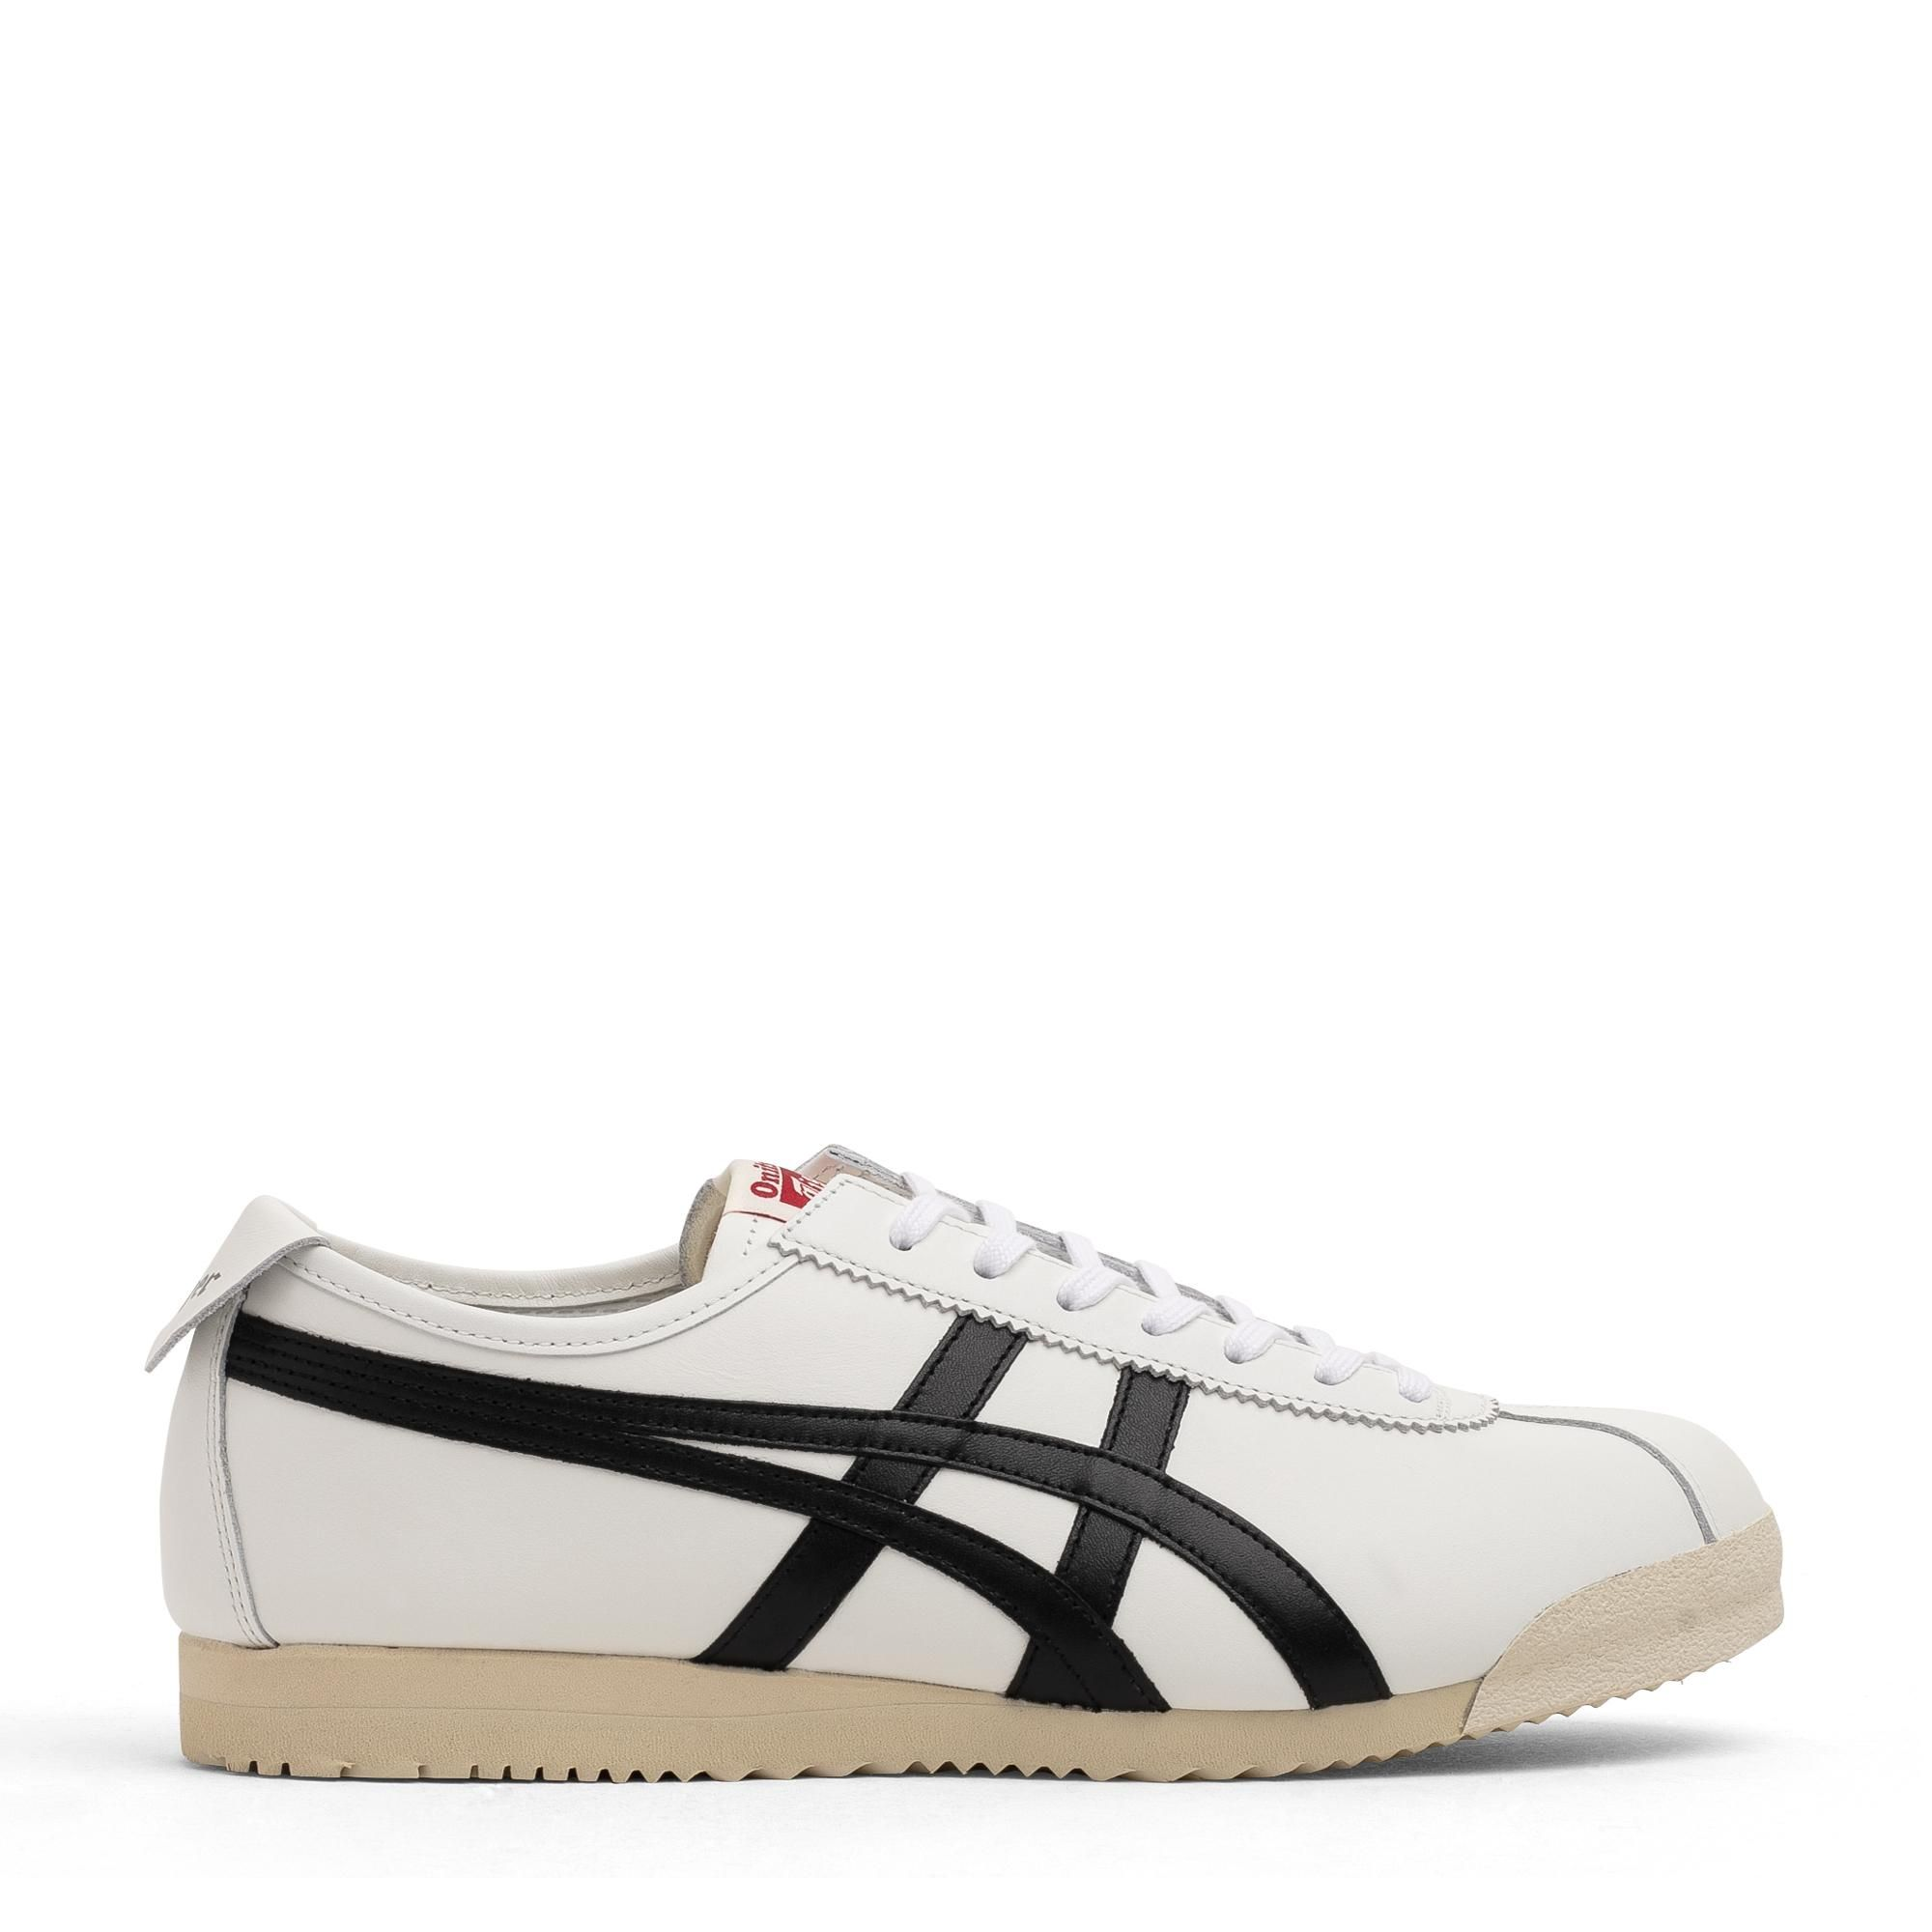 Limber sneakers